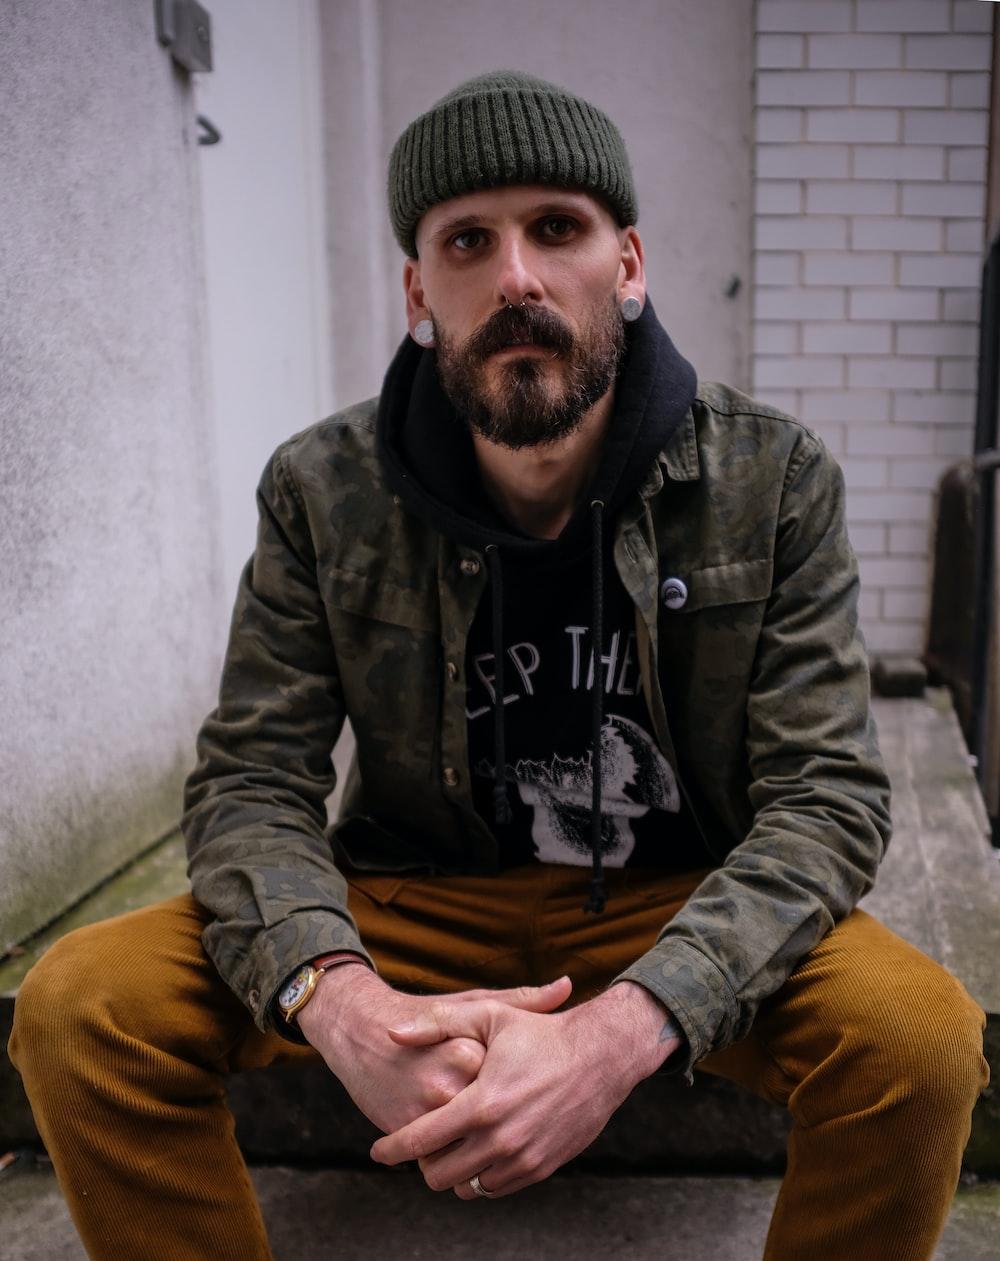 man wearing jacket seated near wall